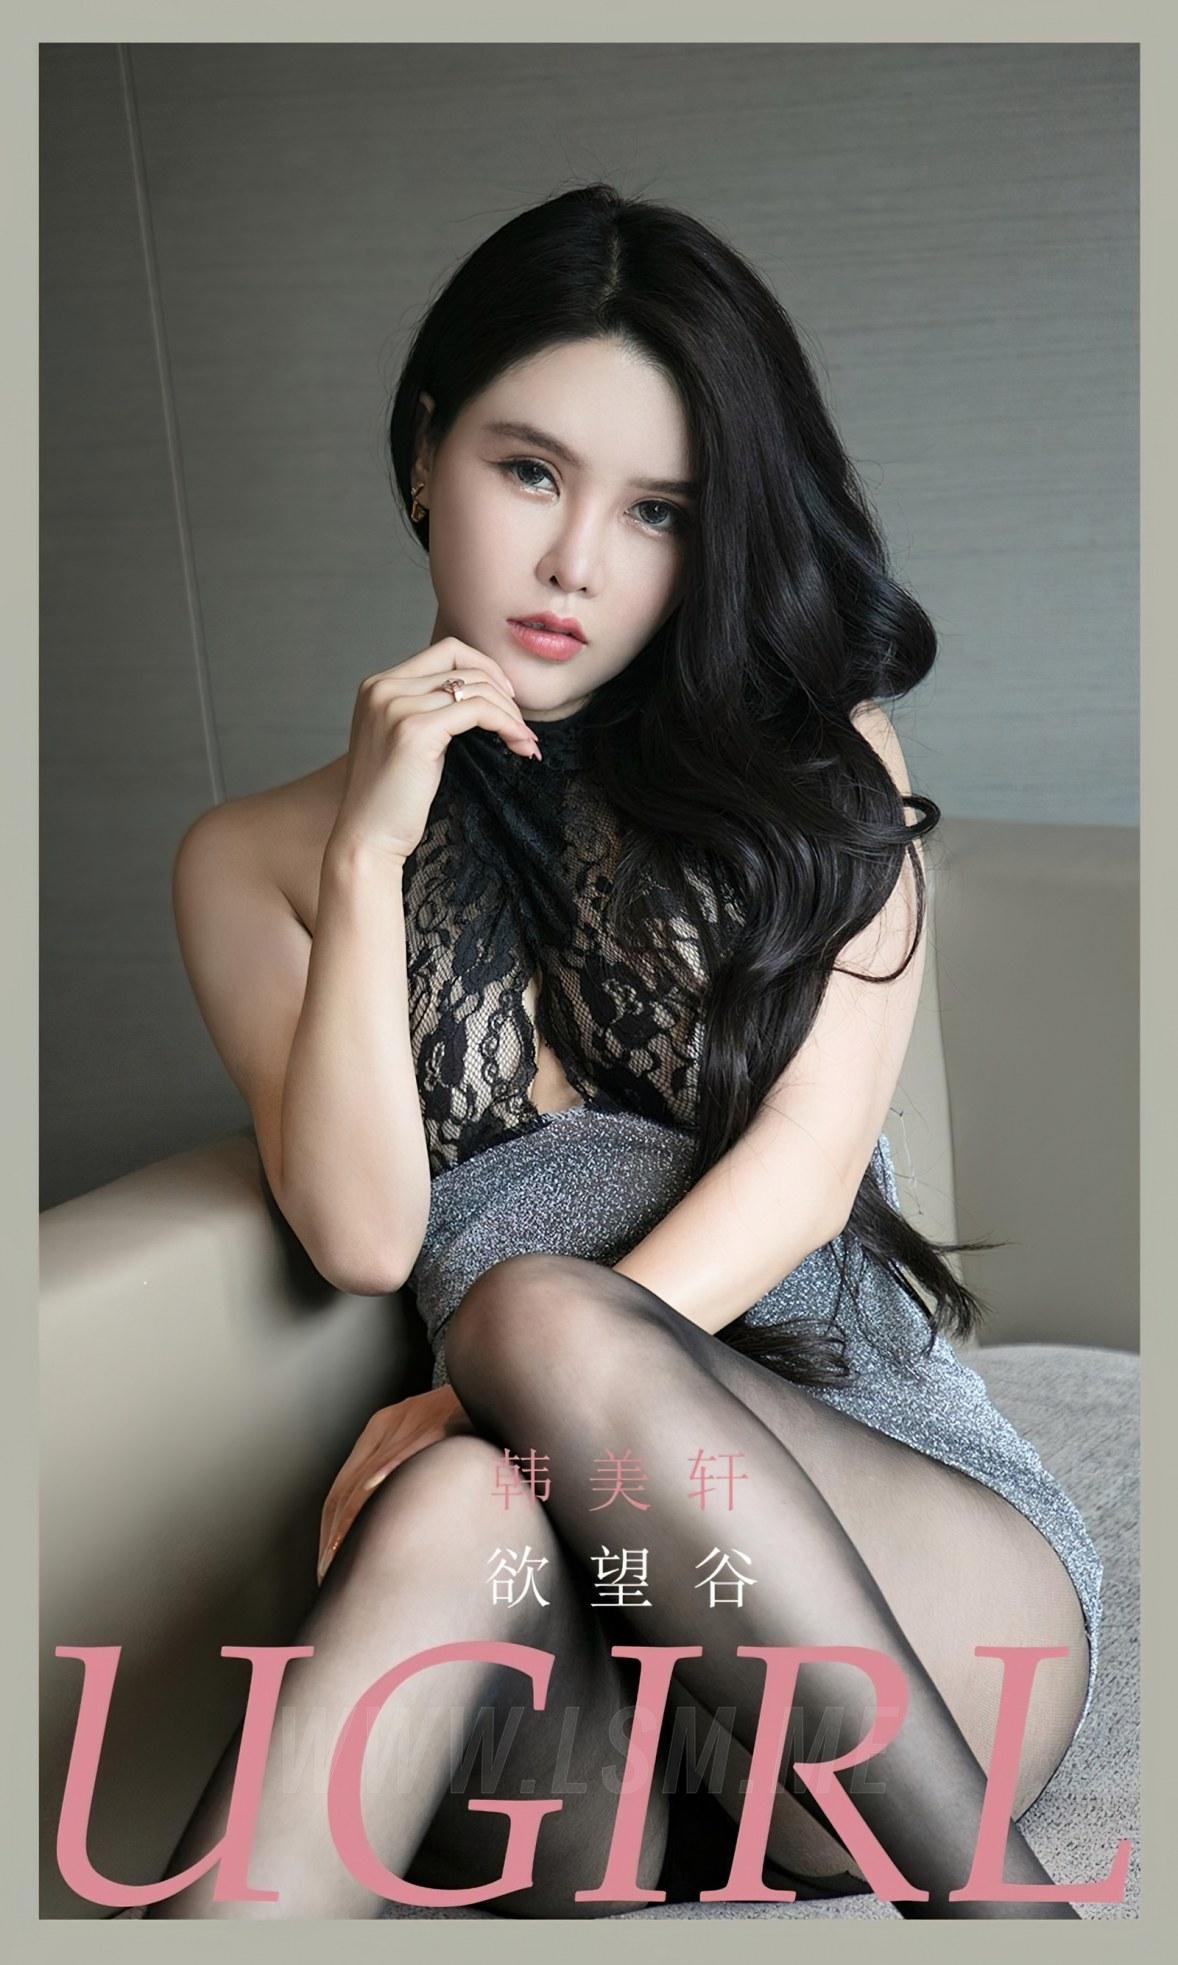 UGirls 爱尤物 No.2168  韩美轩 欲望谷 - 1